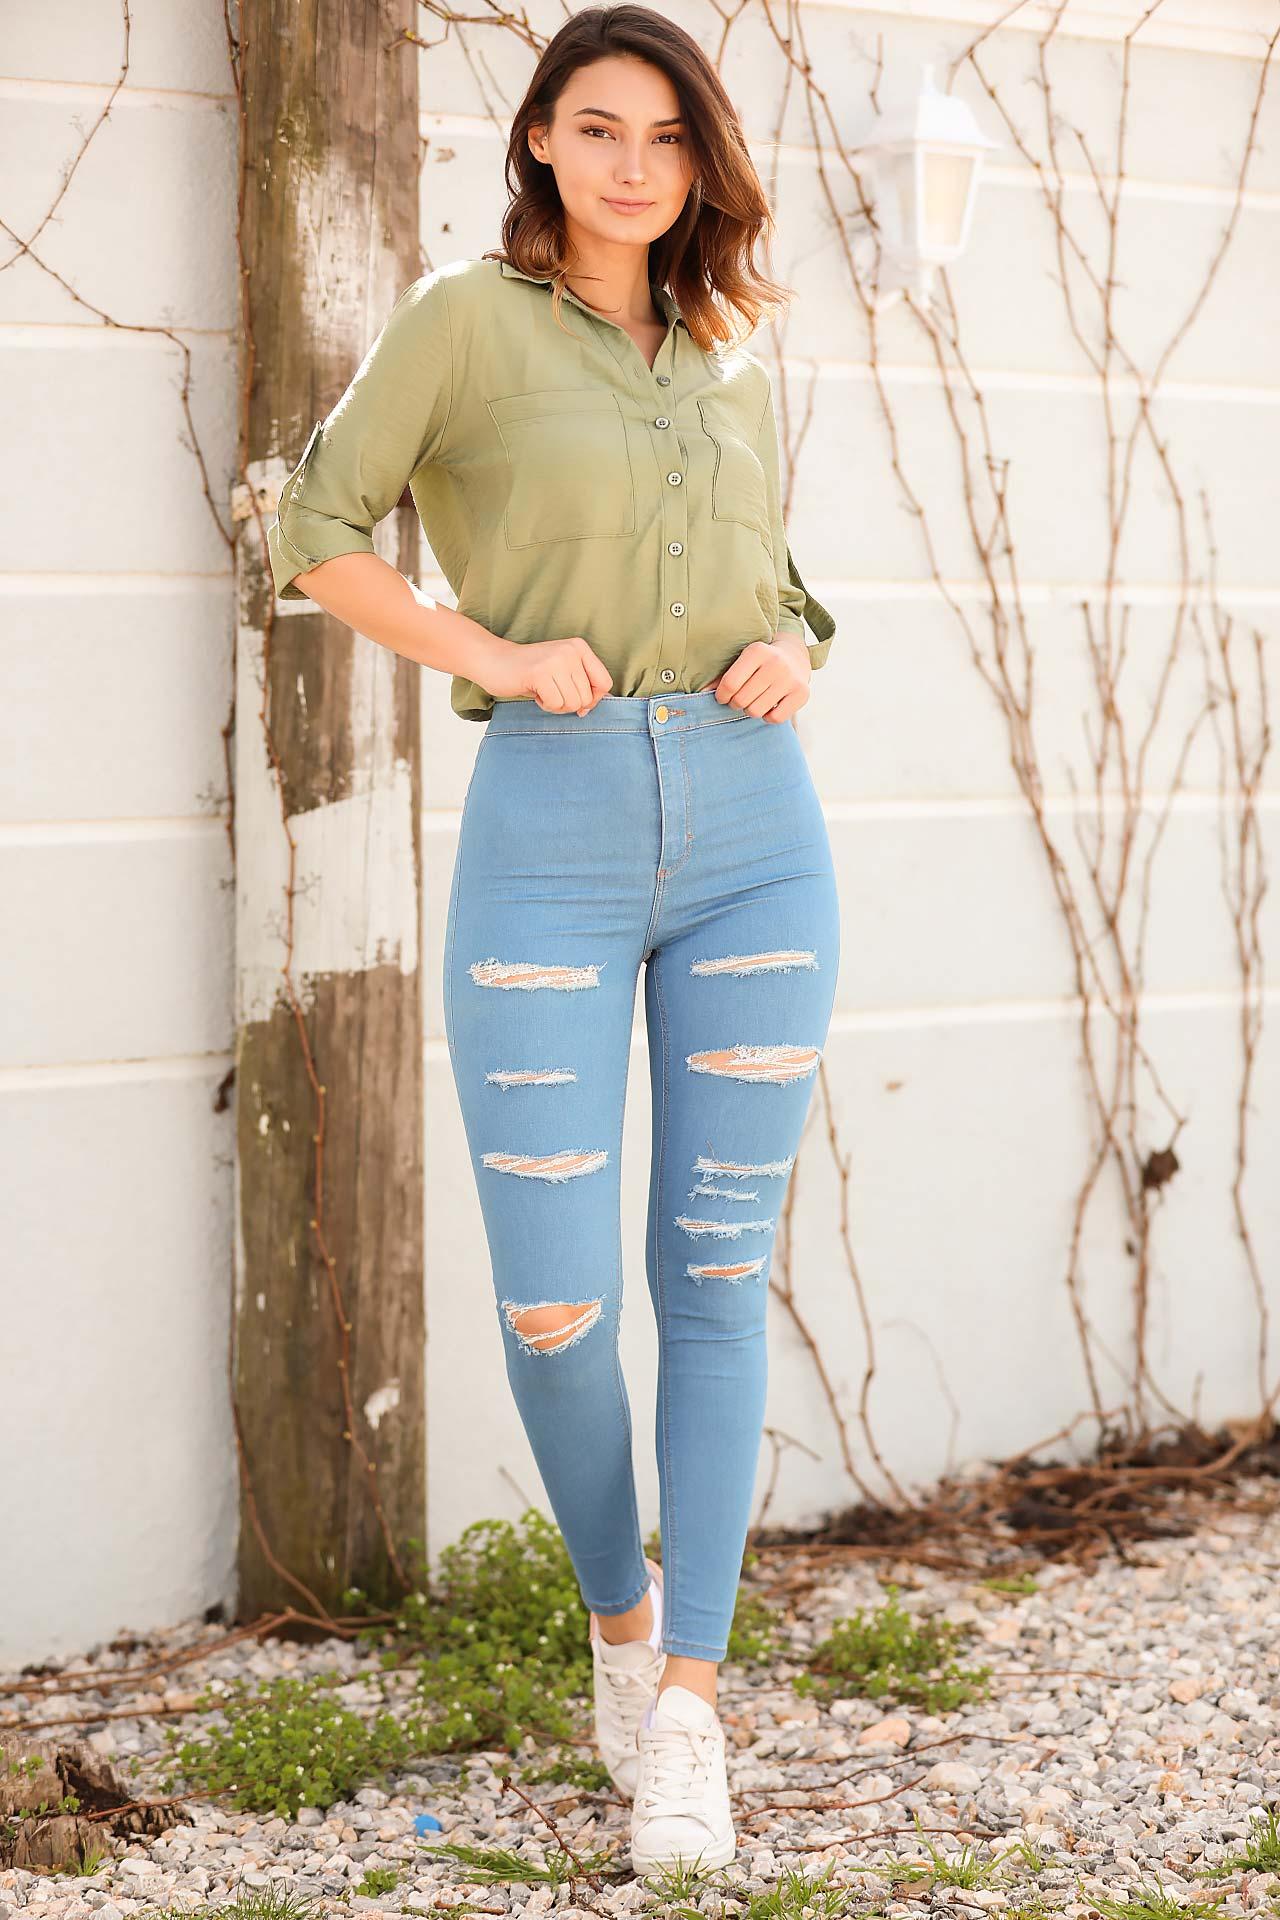 Women's Ripped Blue Jeans